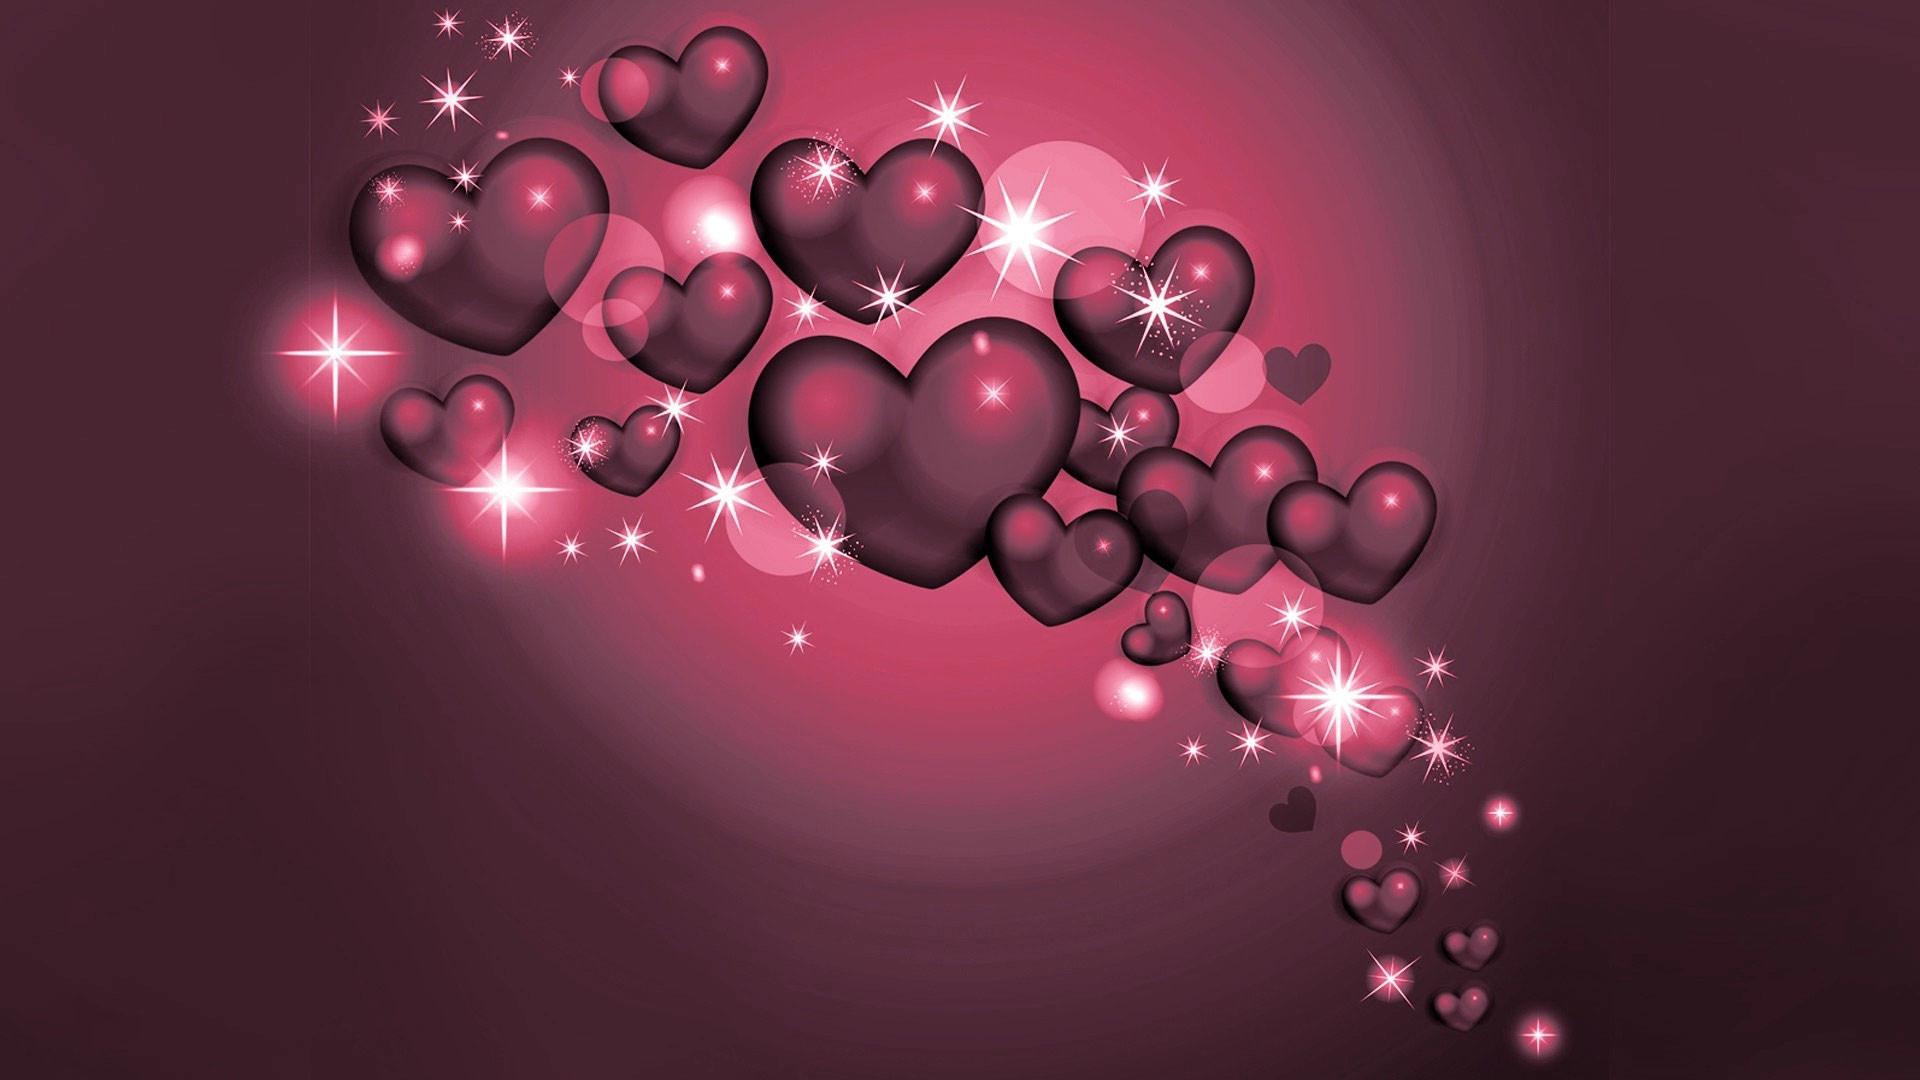 love hd wallpaper 74 images